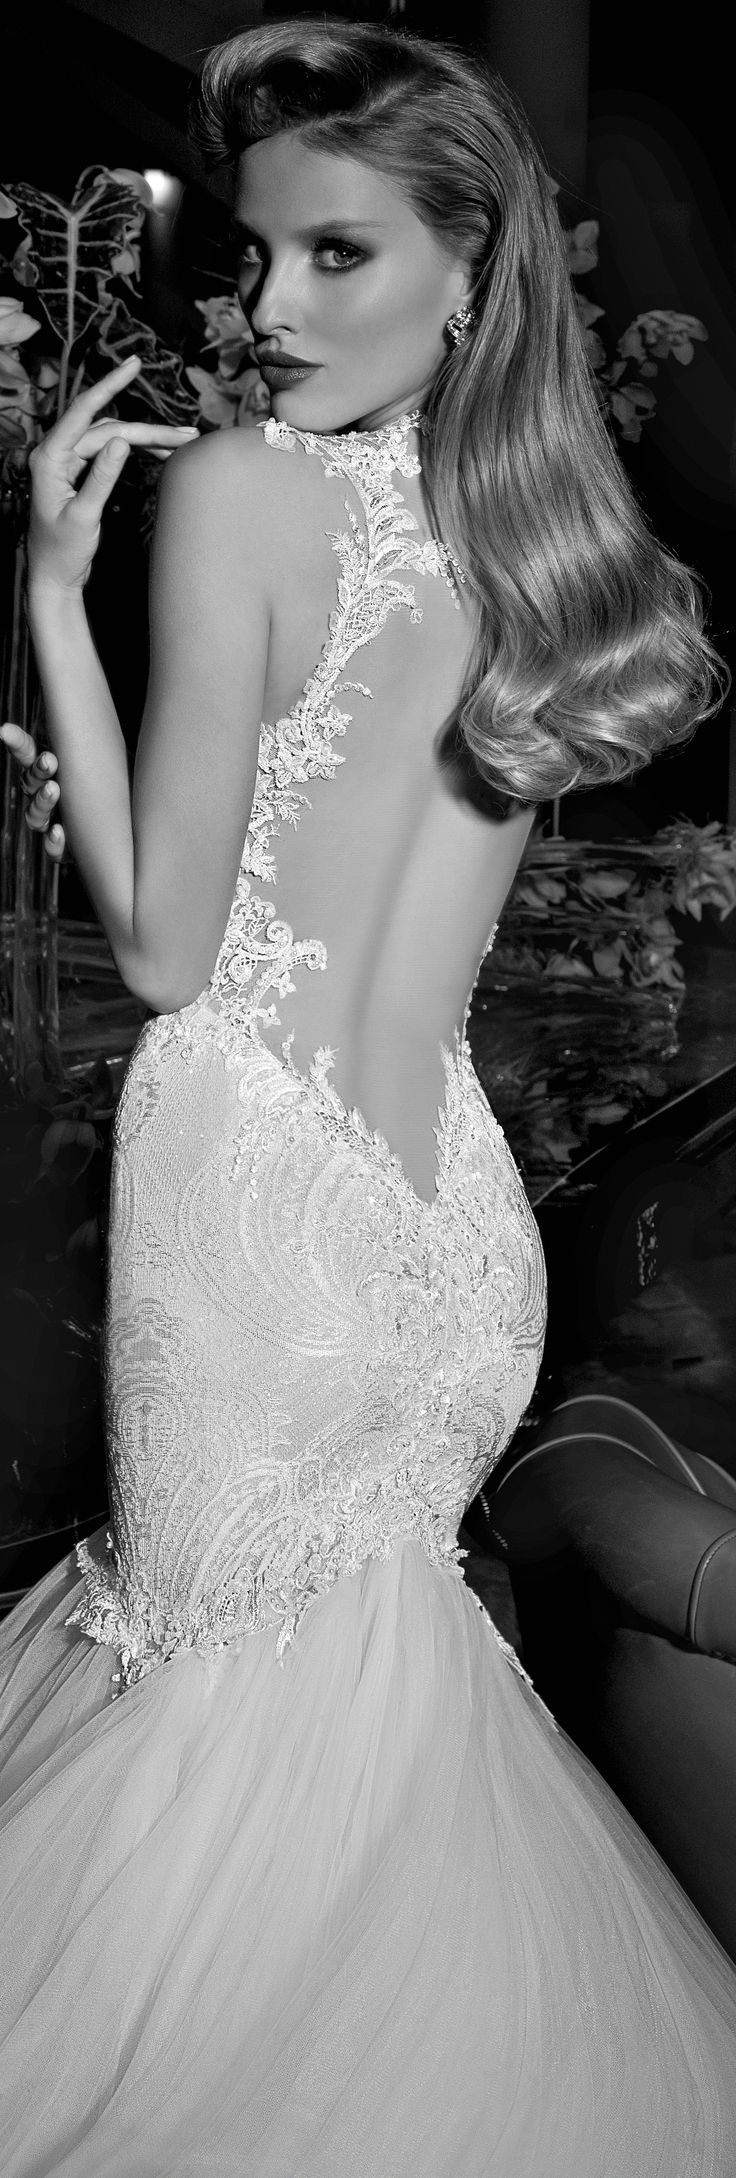 63 best harlem renaissance images on pinterest harlem for Wedding dress rental philadelphia